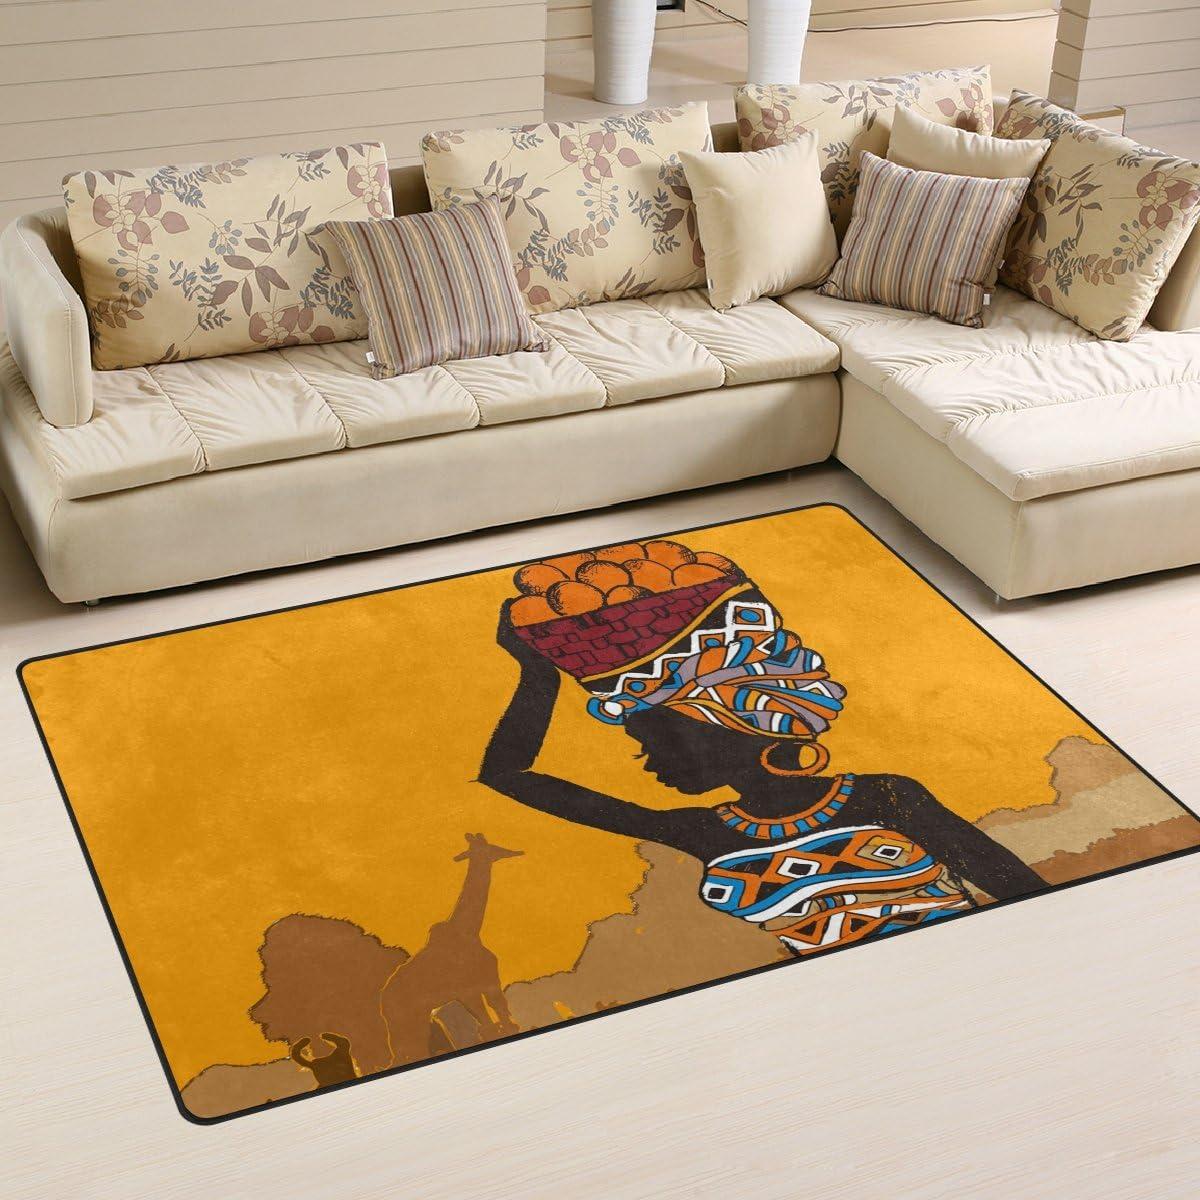 Yochoice Non-Slip Area Rugs Home Decor, Vintage Retro African Beautiful Black Woman Floor Mat Living Room Bedroom Carpets Doormats 60 x 39 inches